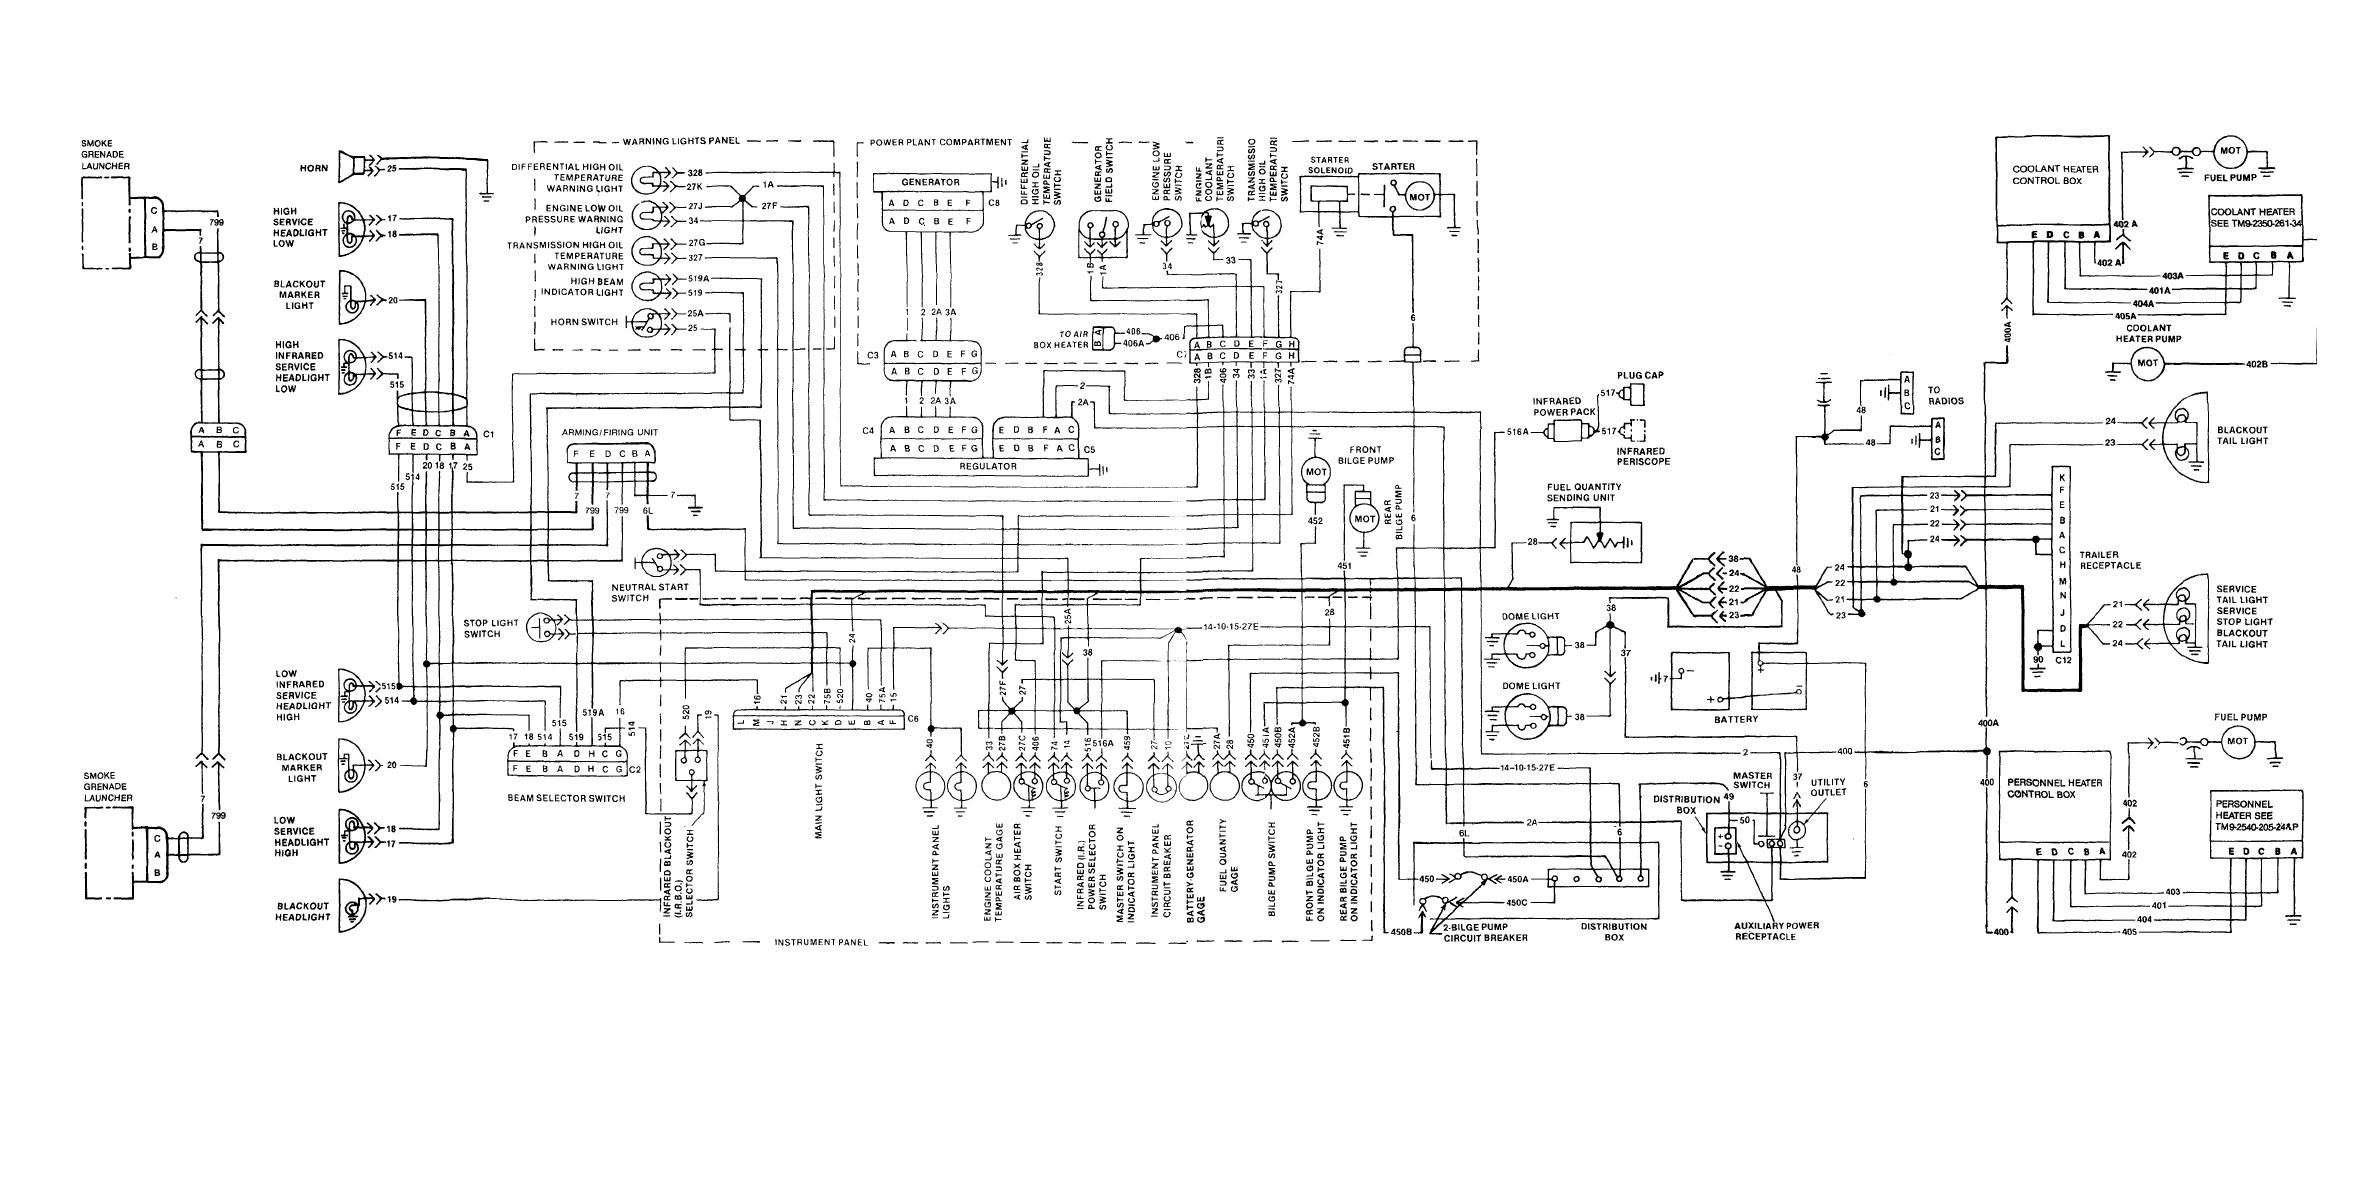 Limitorque L120 40 Wiring Diagram 20 Diagramdesign